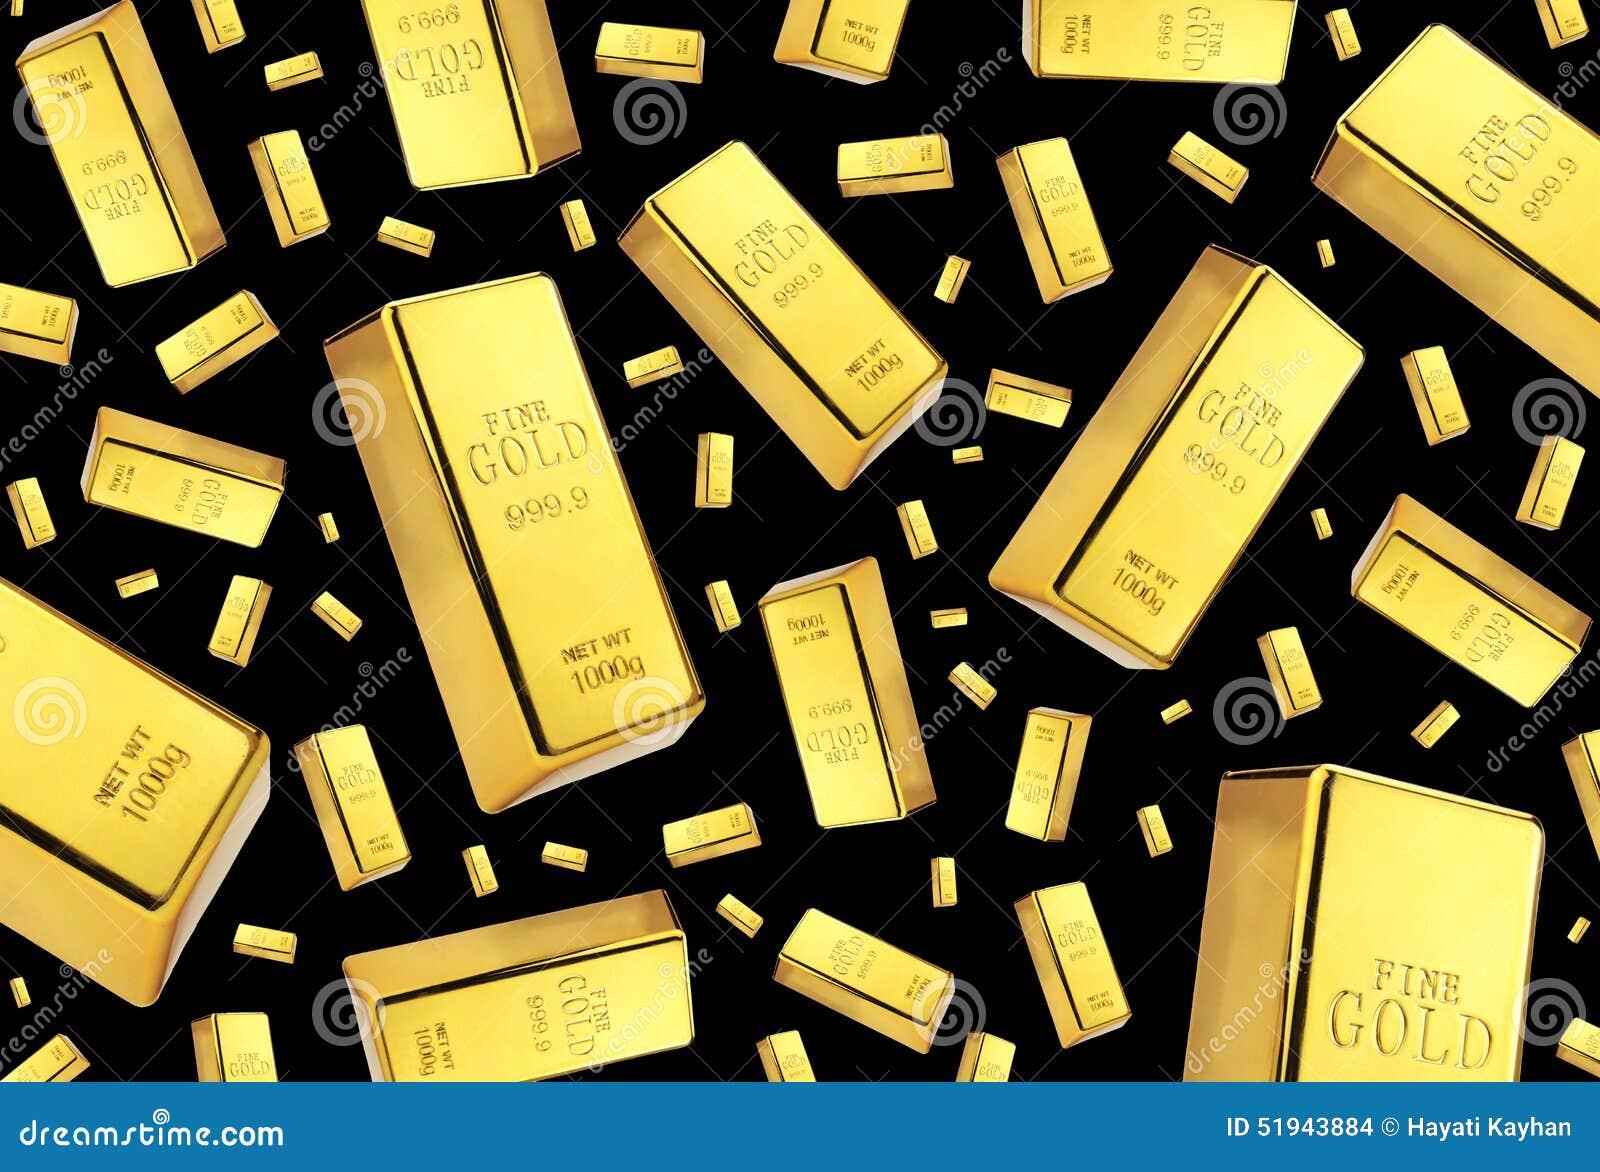 gold bar black background - photo #15